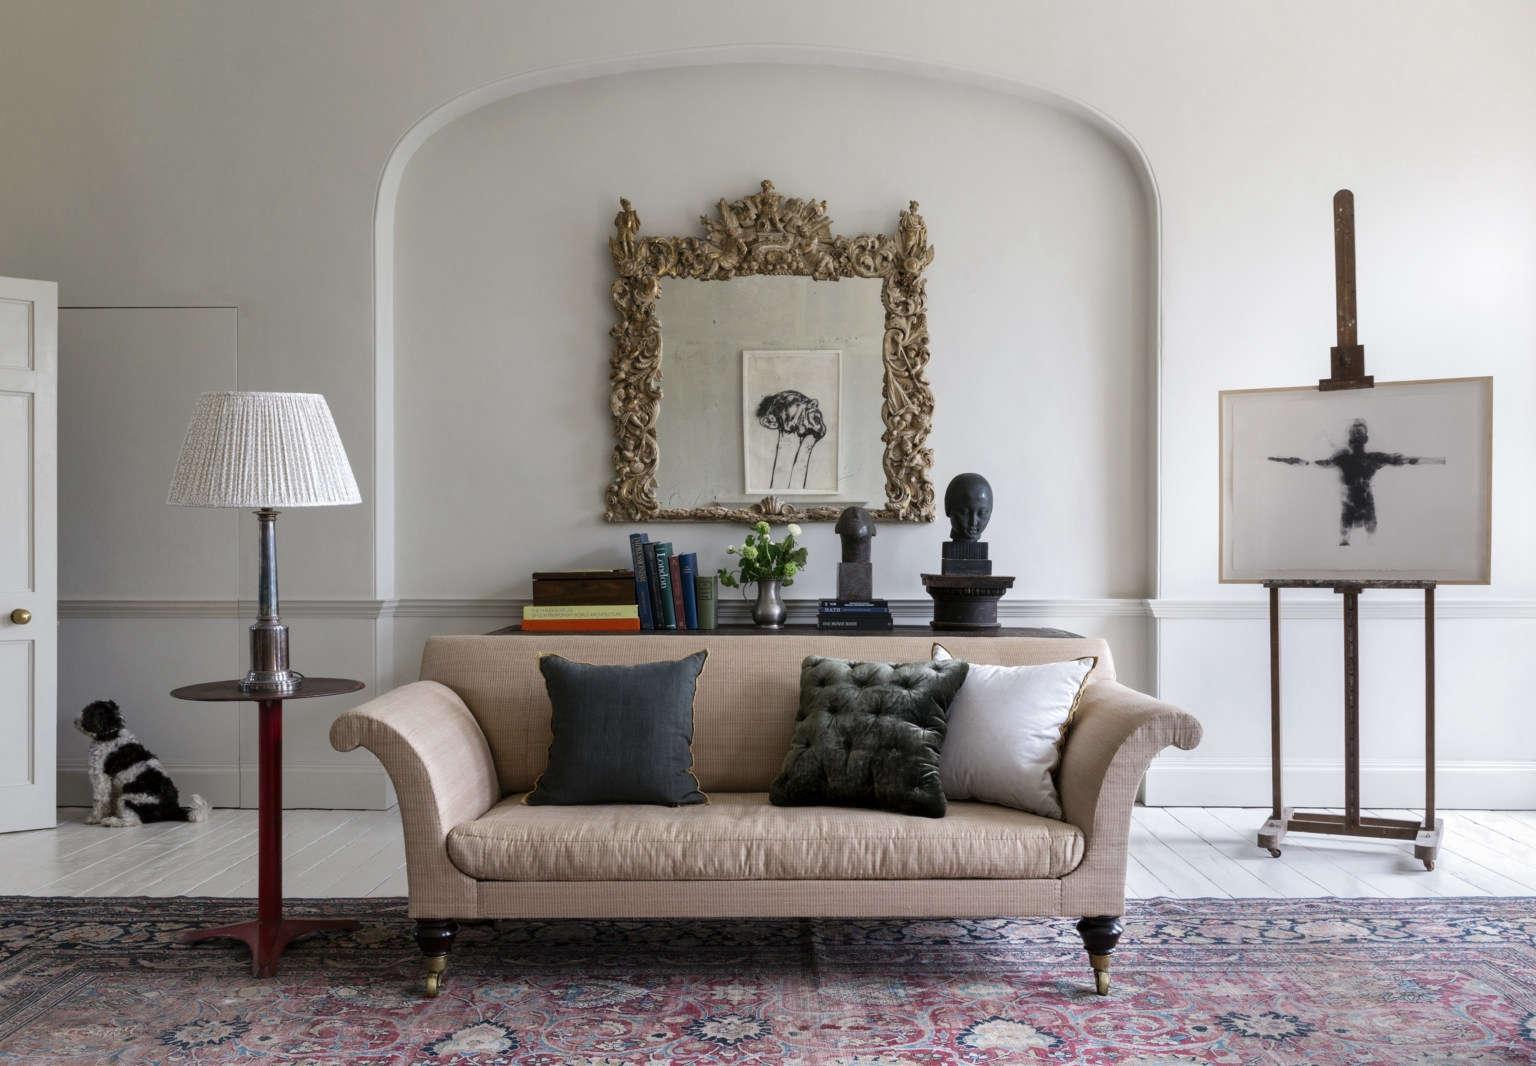 gilpin house sitting room bath england via howe london claudia rocha photo 1536x1066